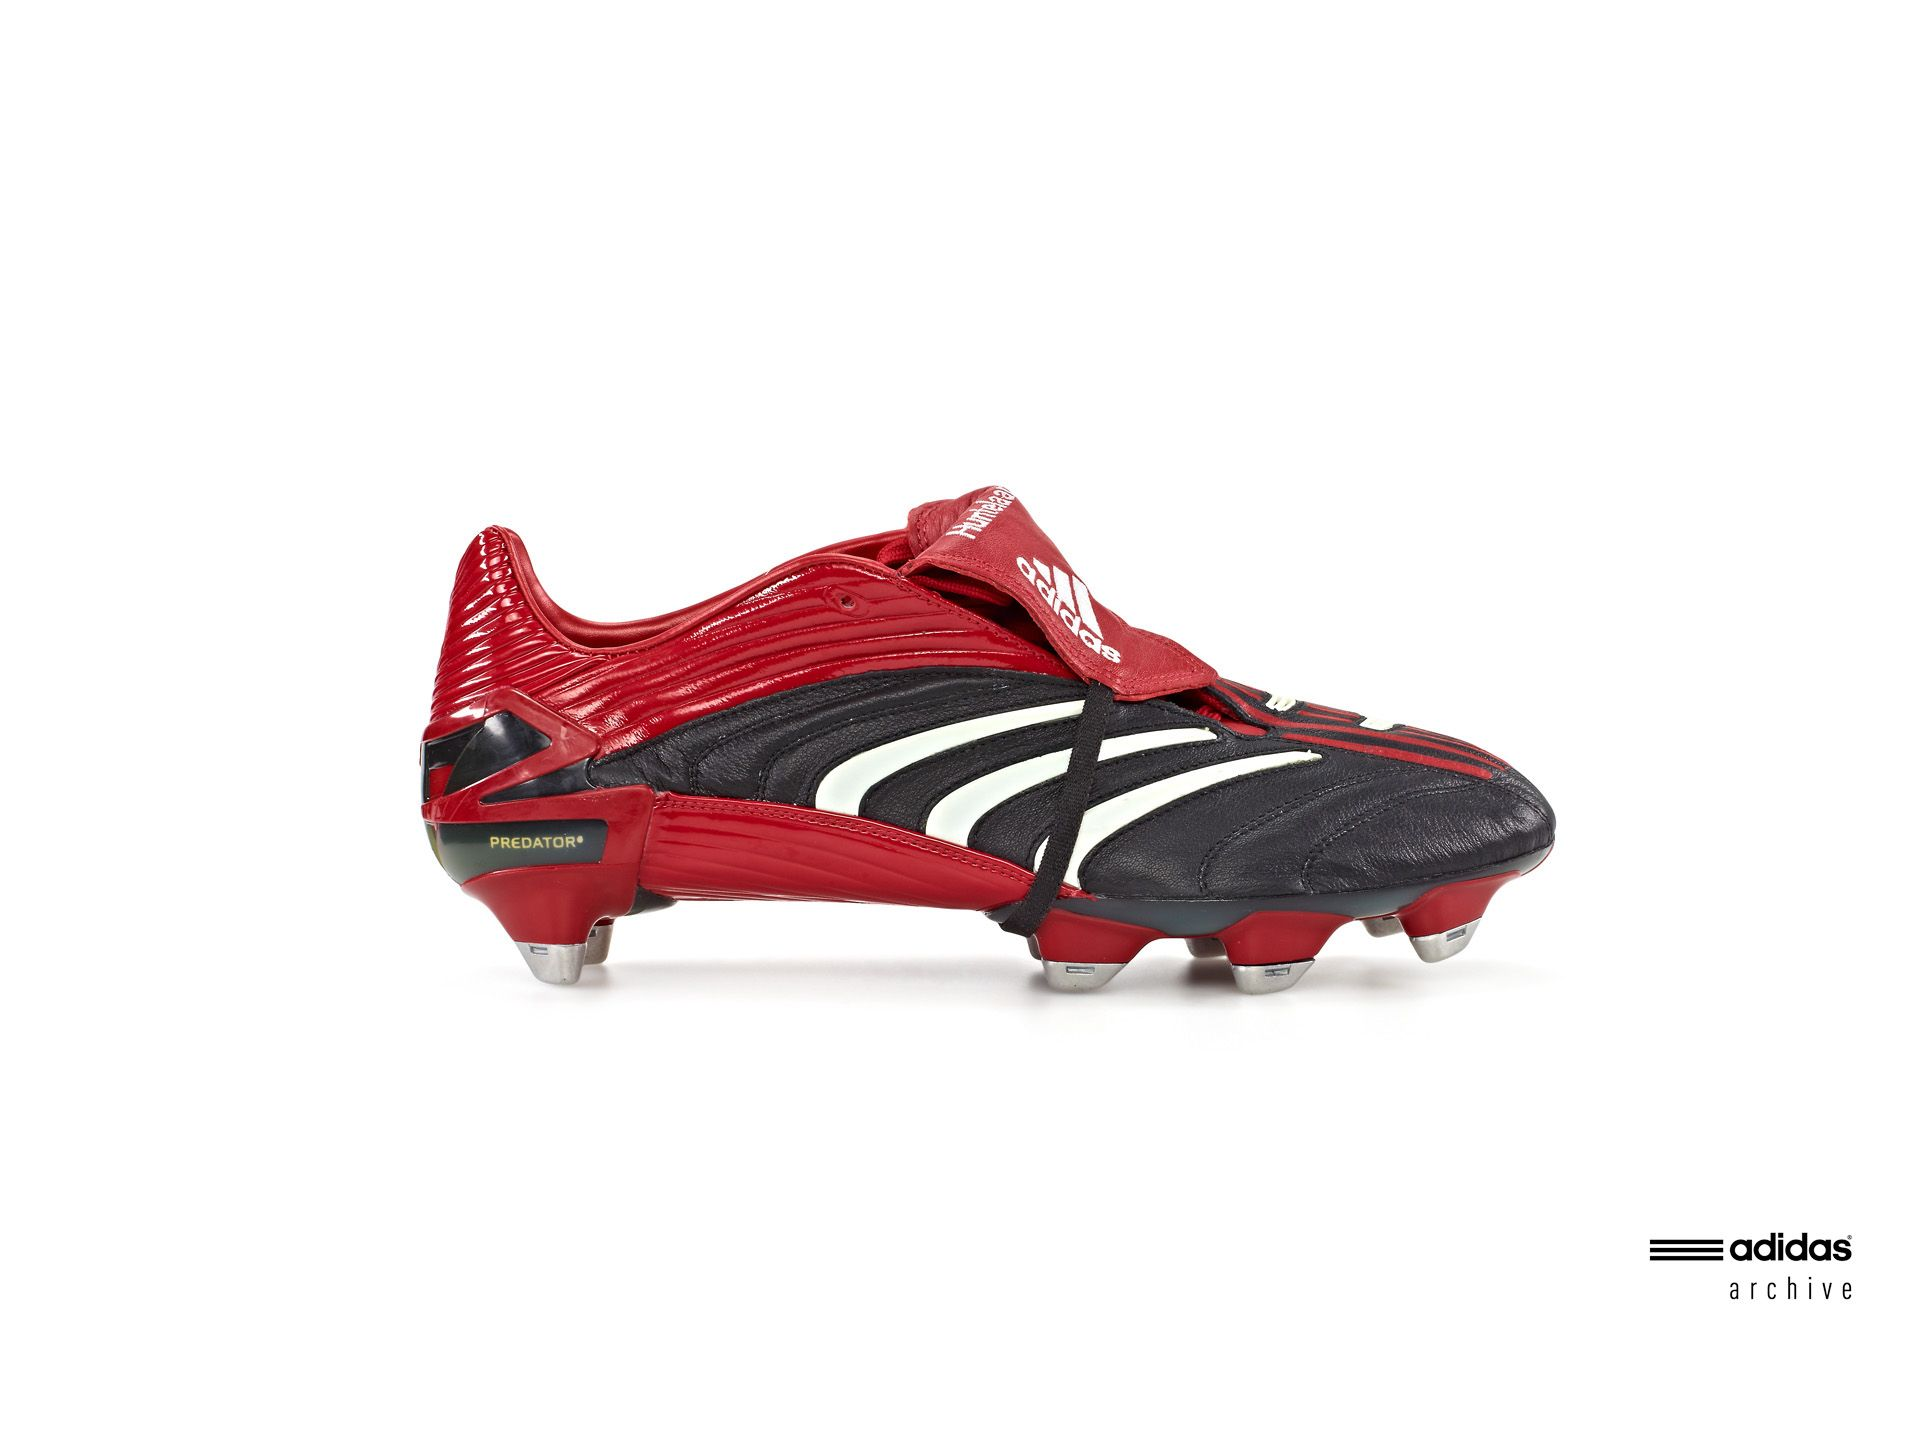 Adidas Predator Absolute  a674384ad42b6